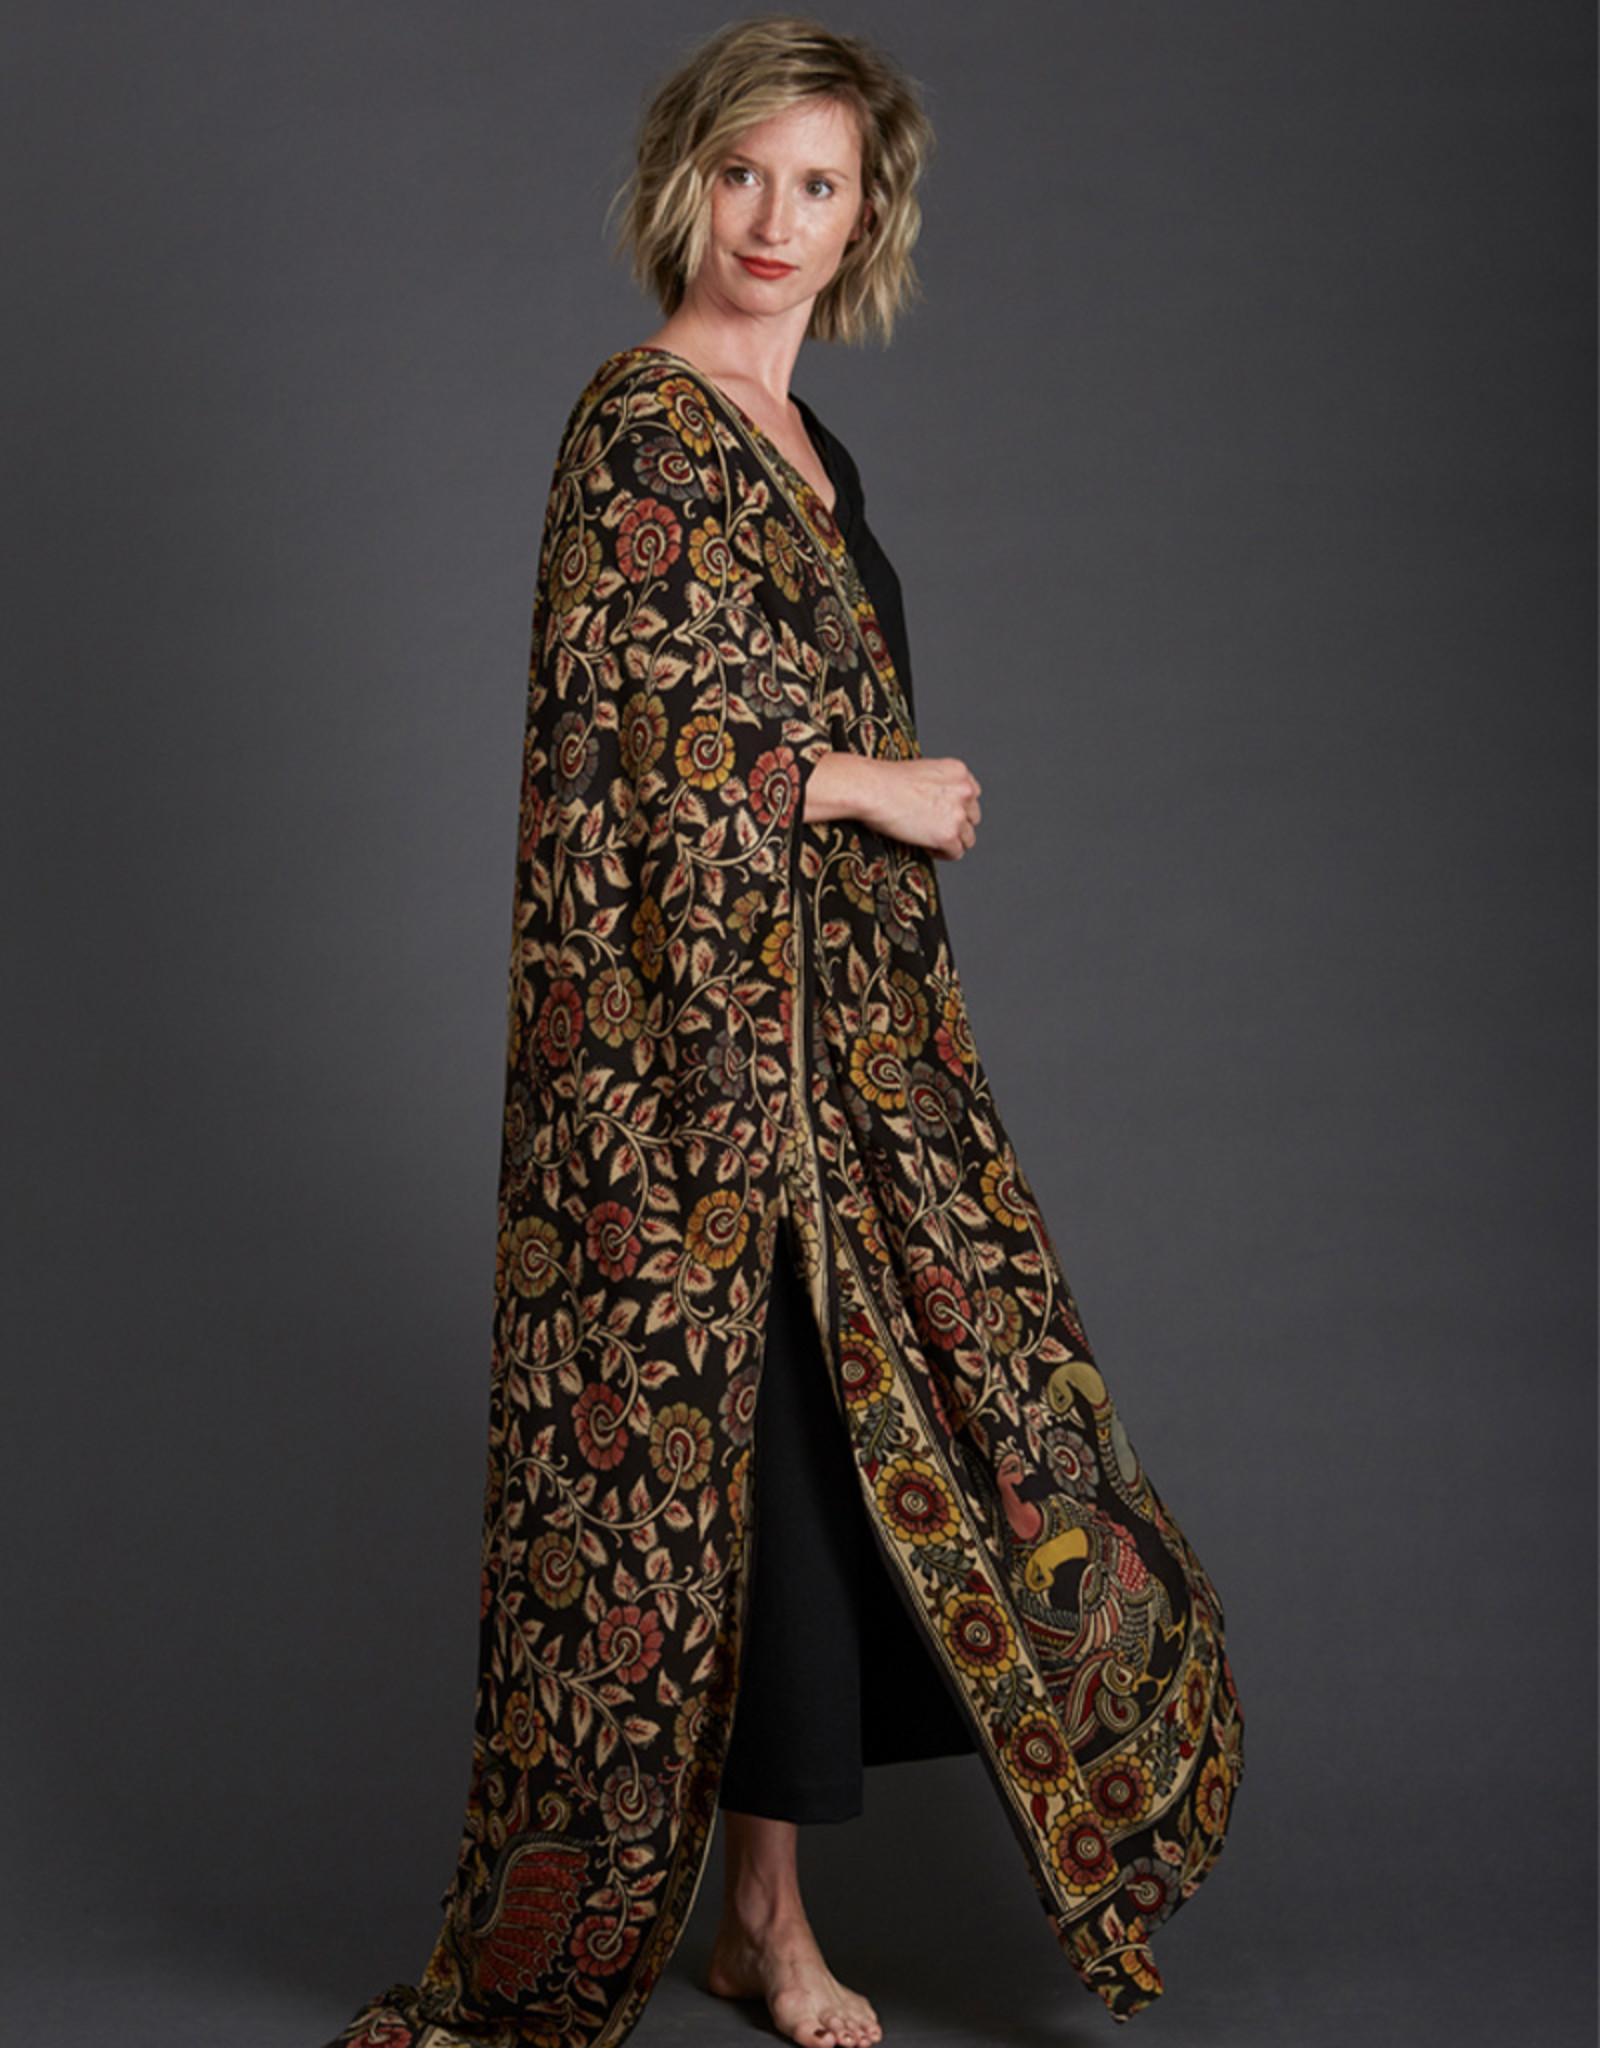 Dwaraka Hand Painted Silk Chiffon Shawl Black Floral